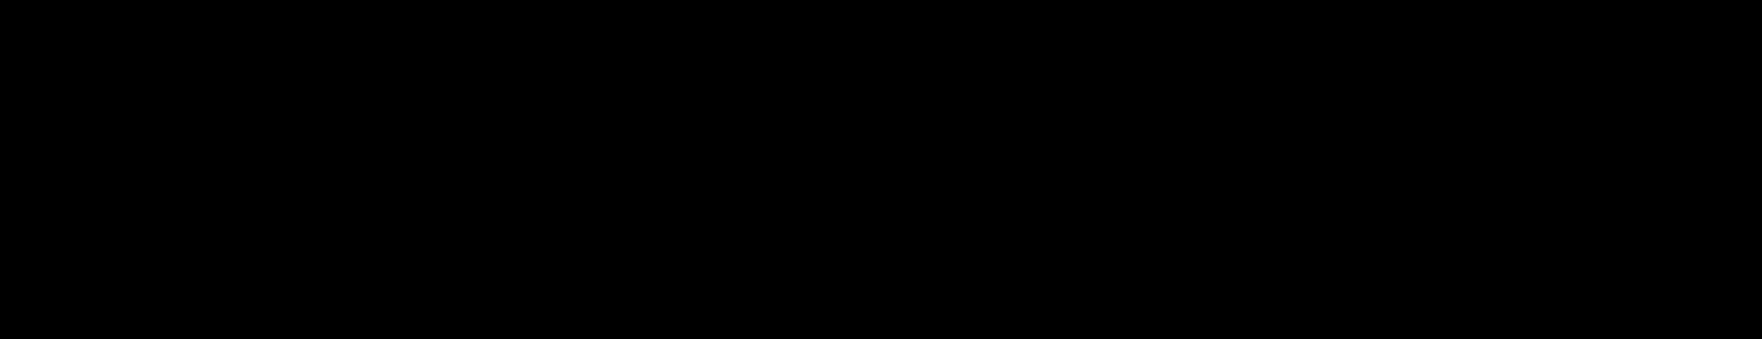 logo-qc-wordmark 2019.png